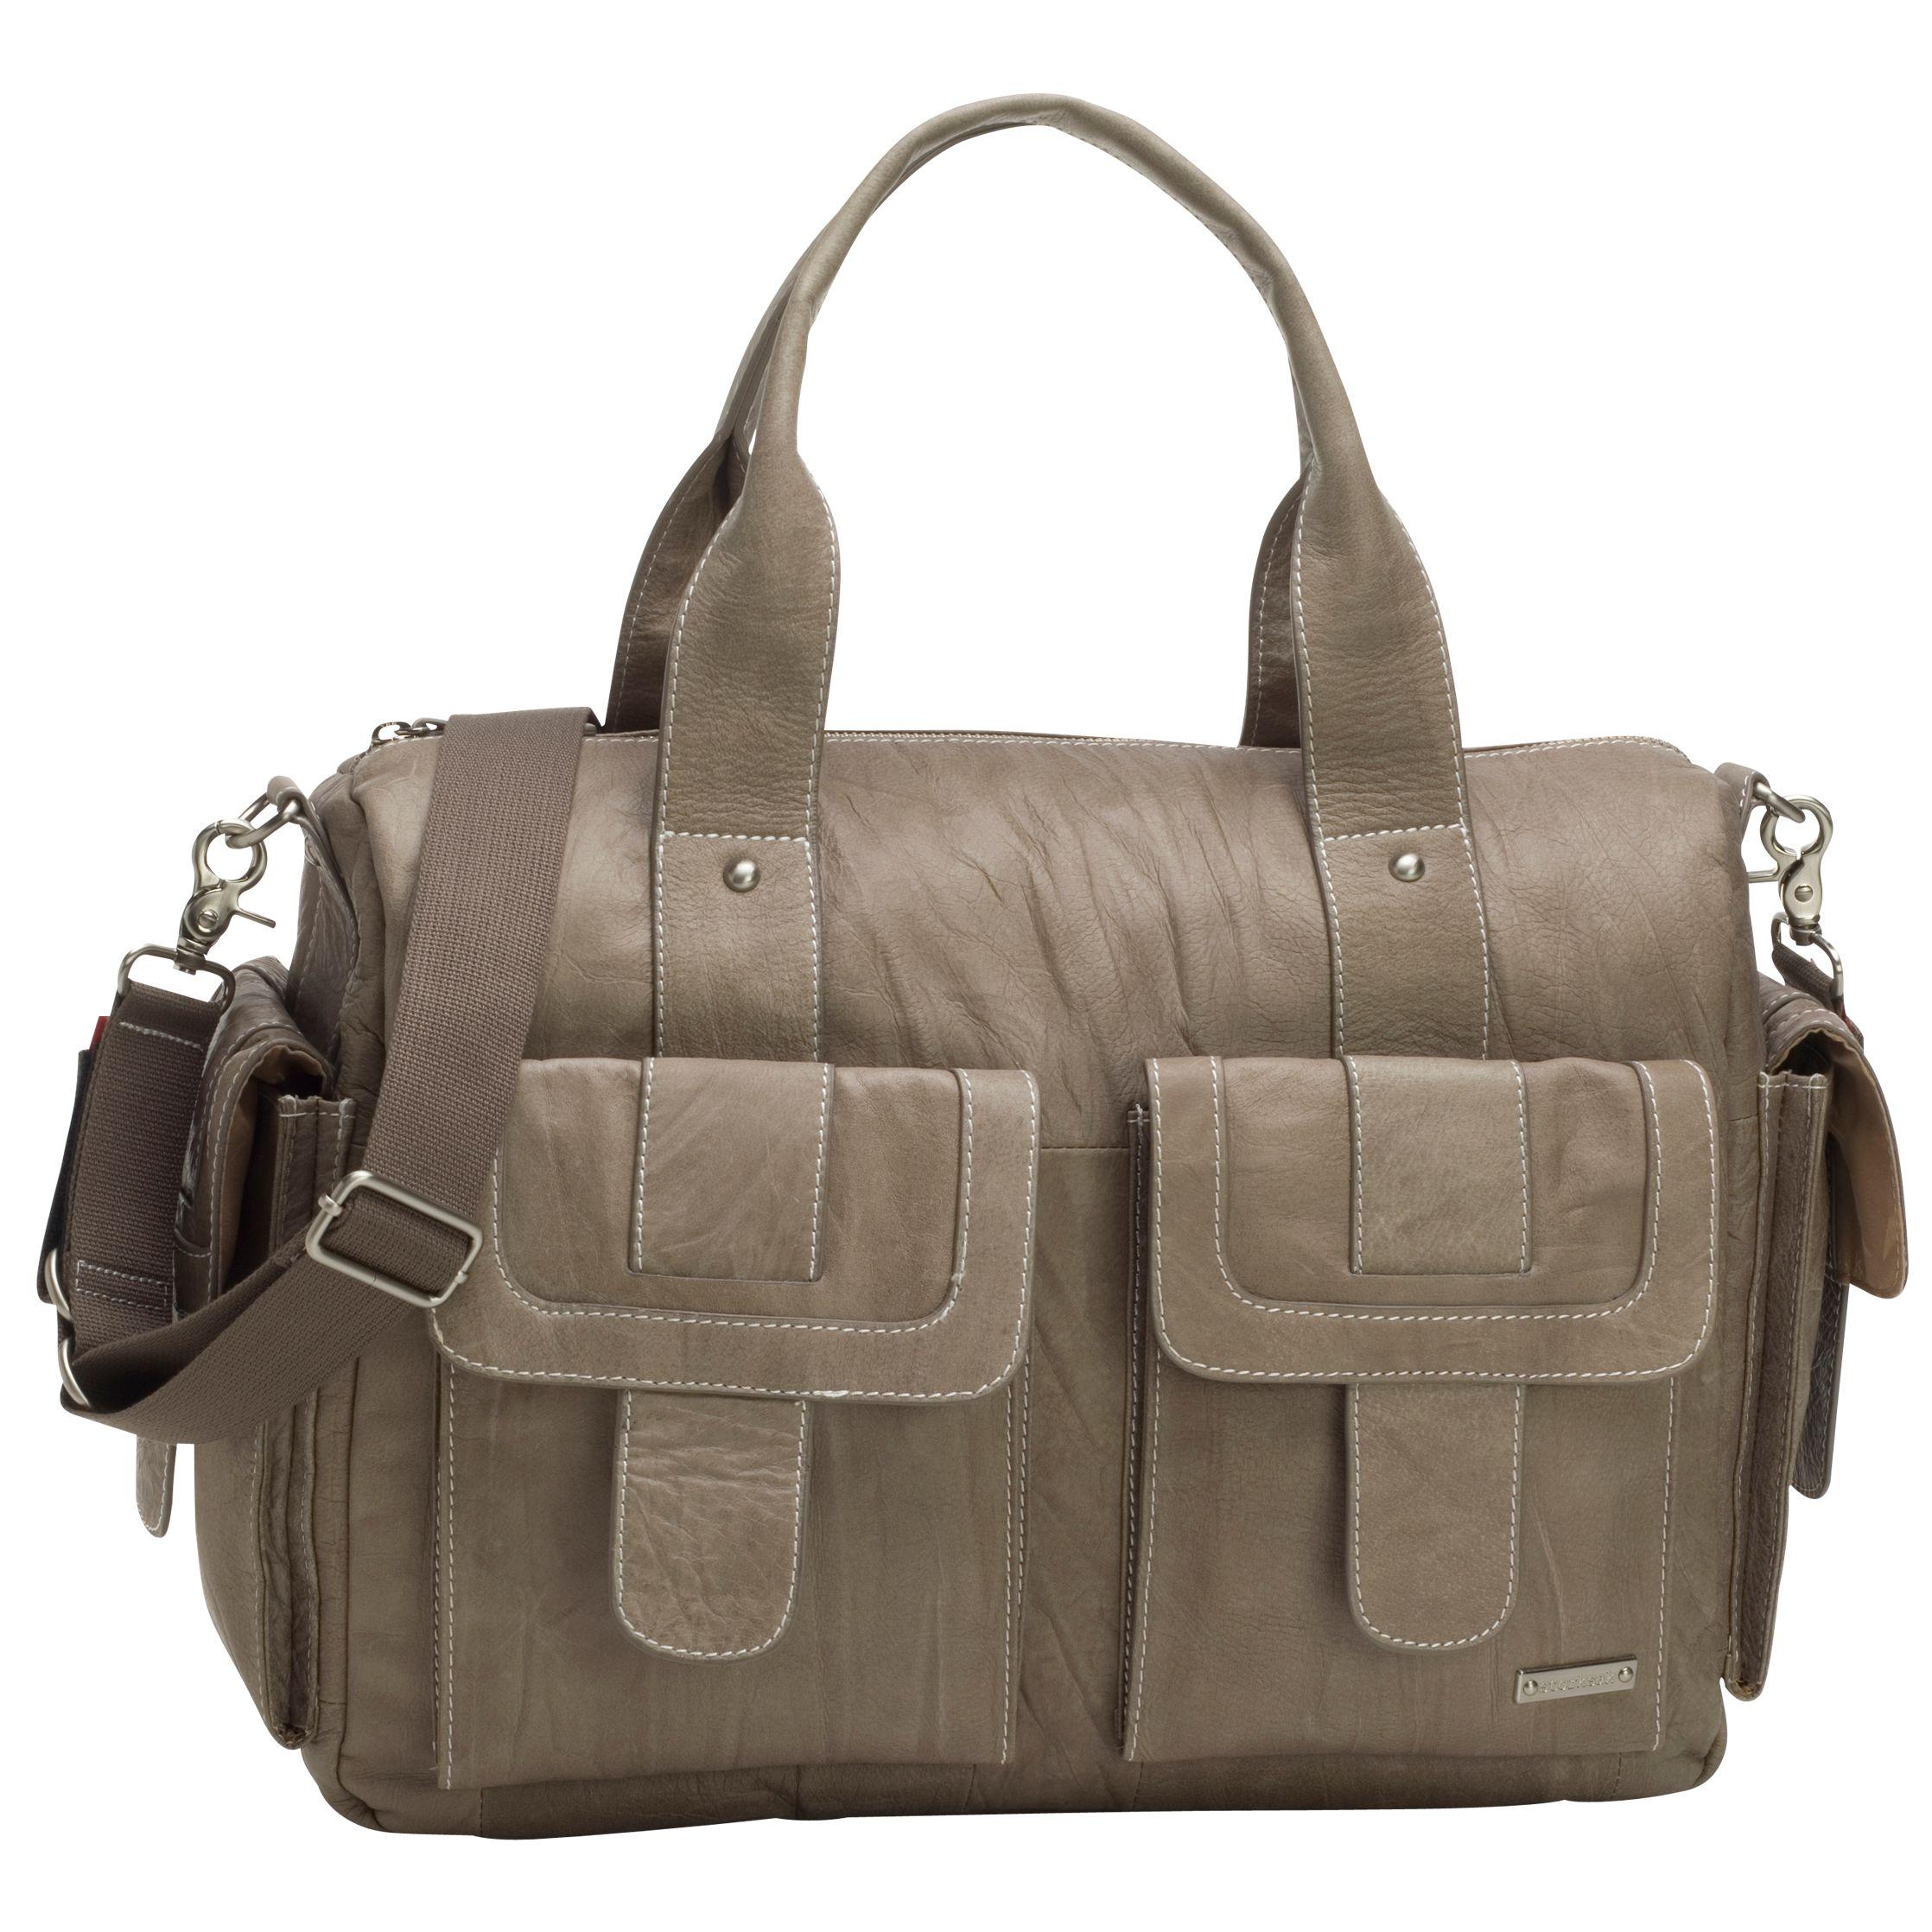 Storksak Storksak Sofia Leather Baby Changing Bag, Taupe